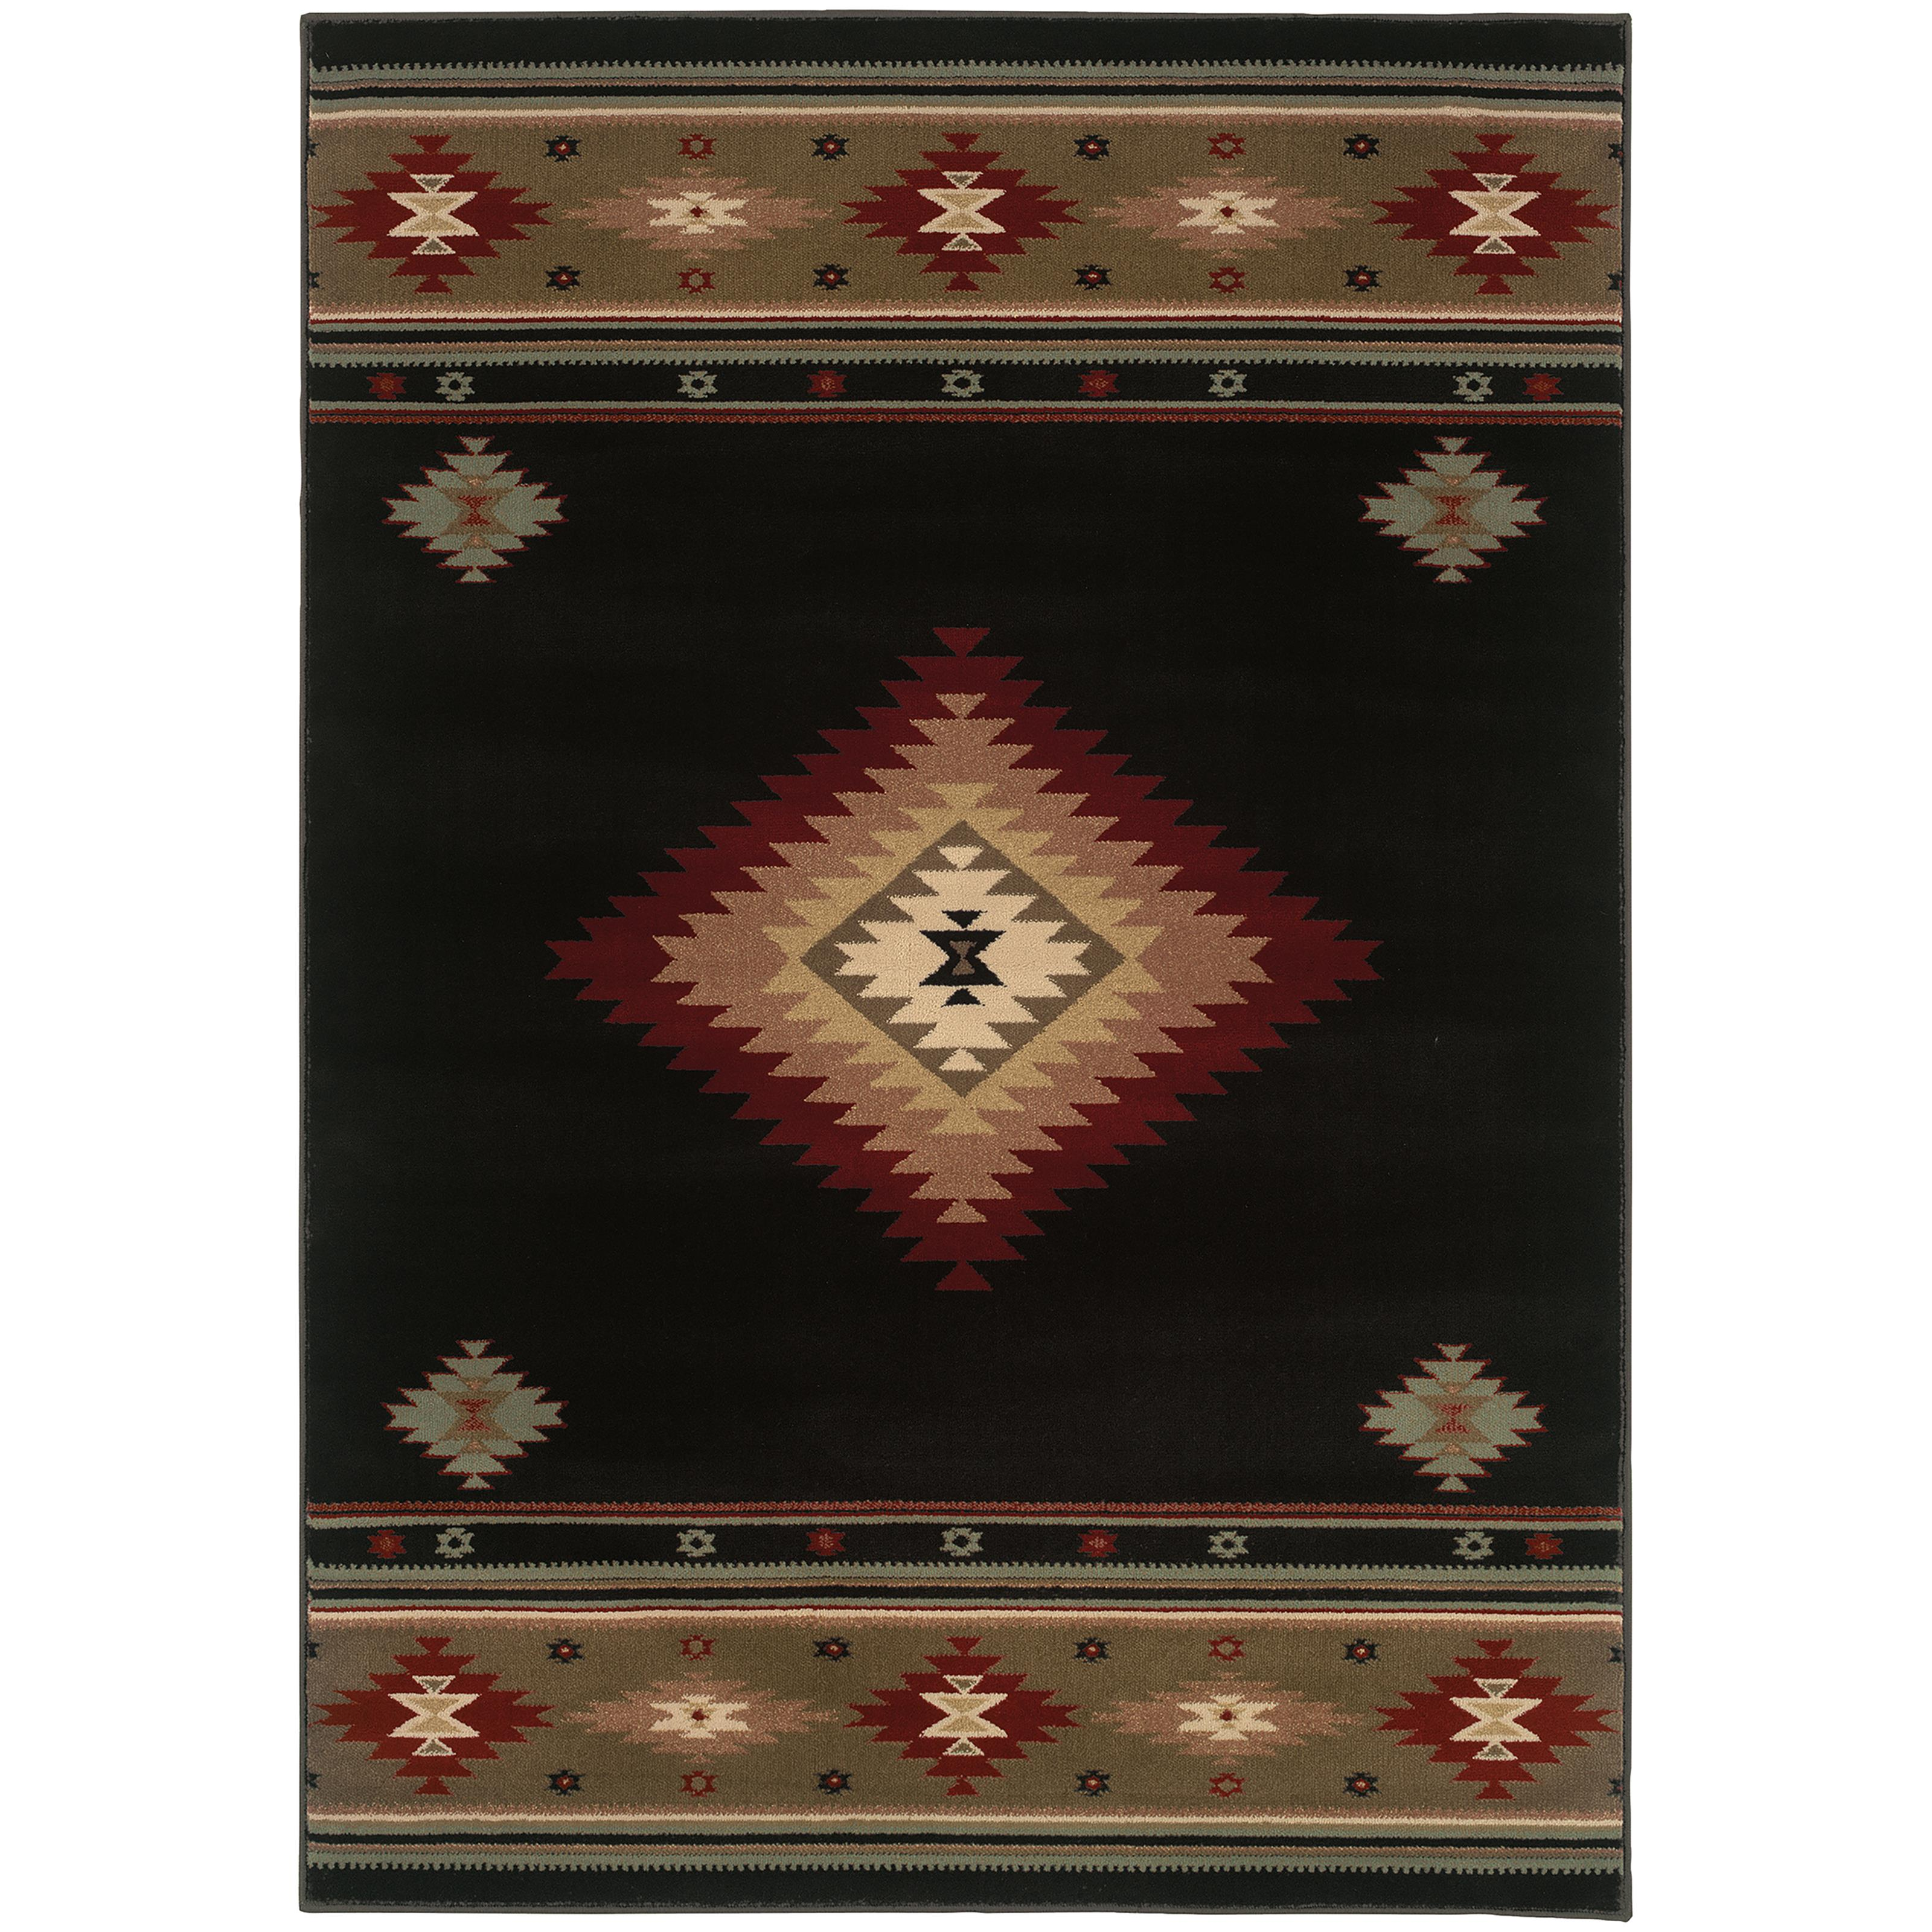 Oriental Weavers Hudson 10' X 13' Rug - Item Number: H087G1305396ST